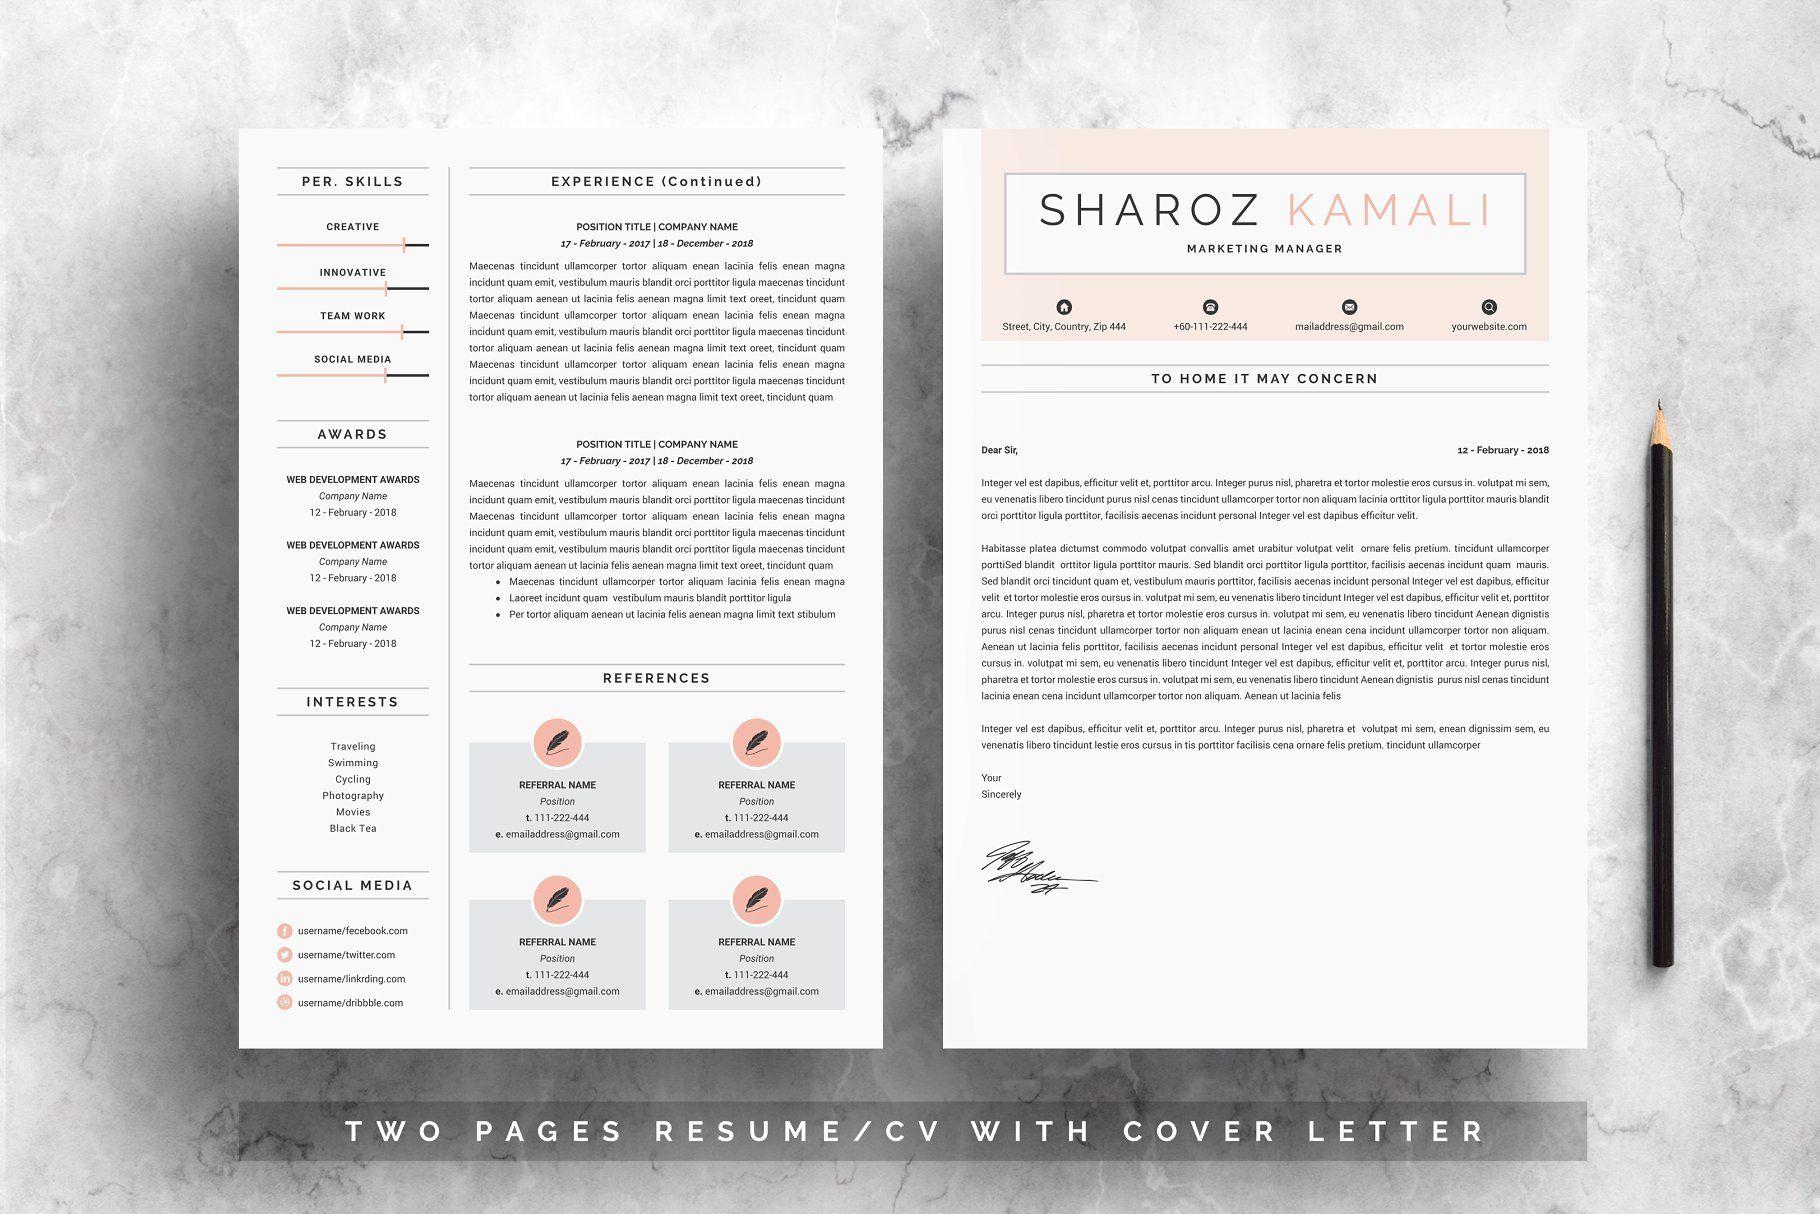 Minimalist resume 4 pages pack resumeminimalistpages